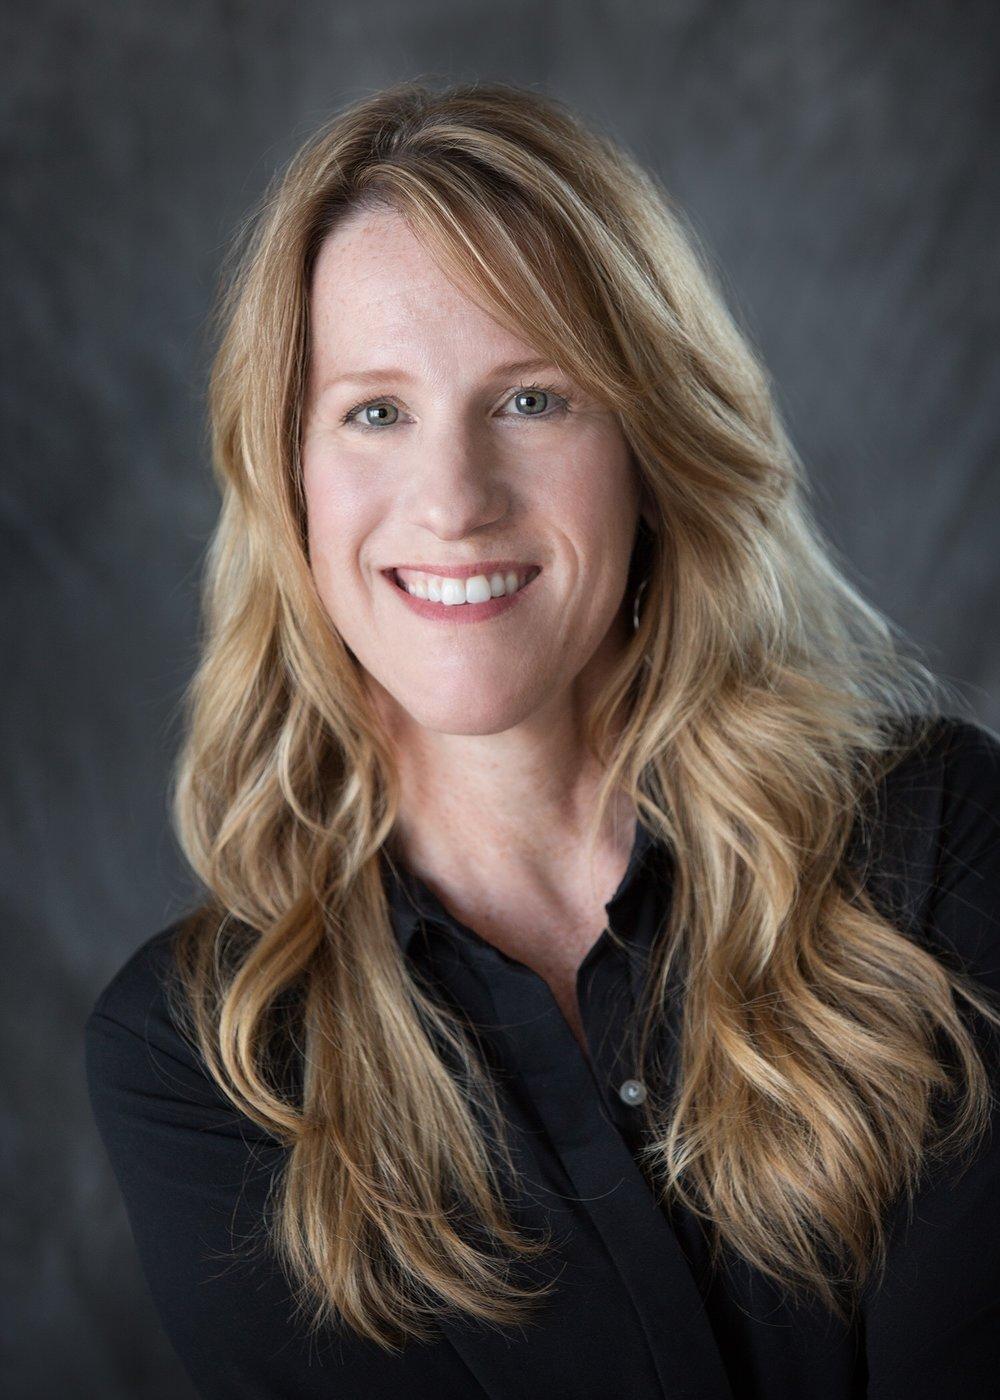 Jill Peterson Headshot